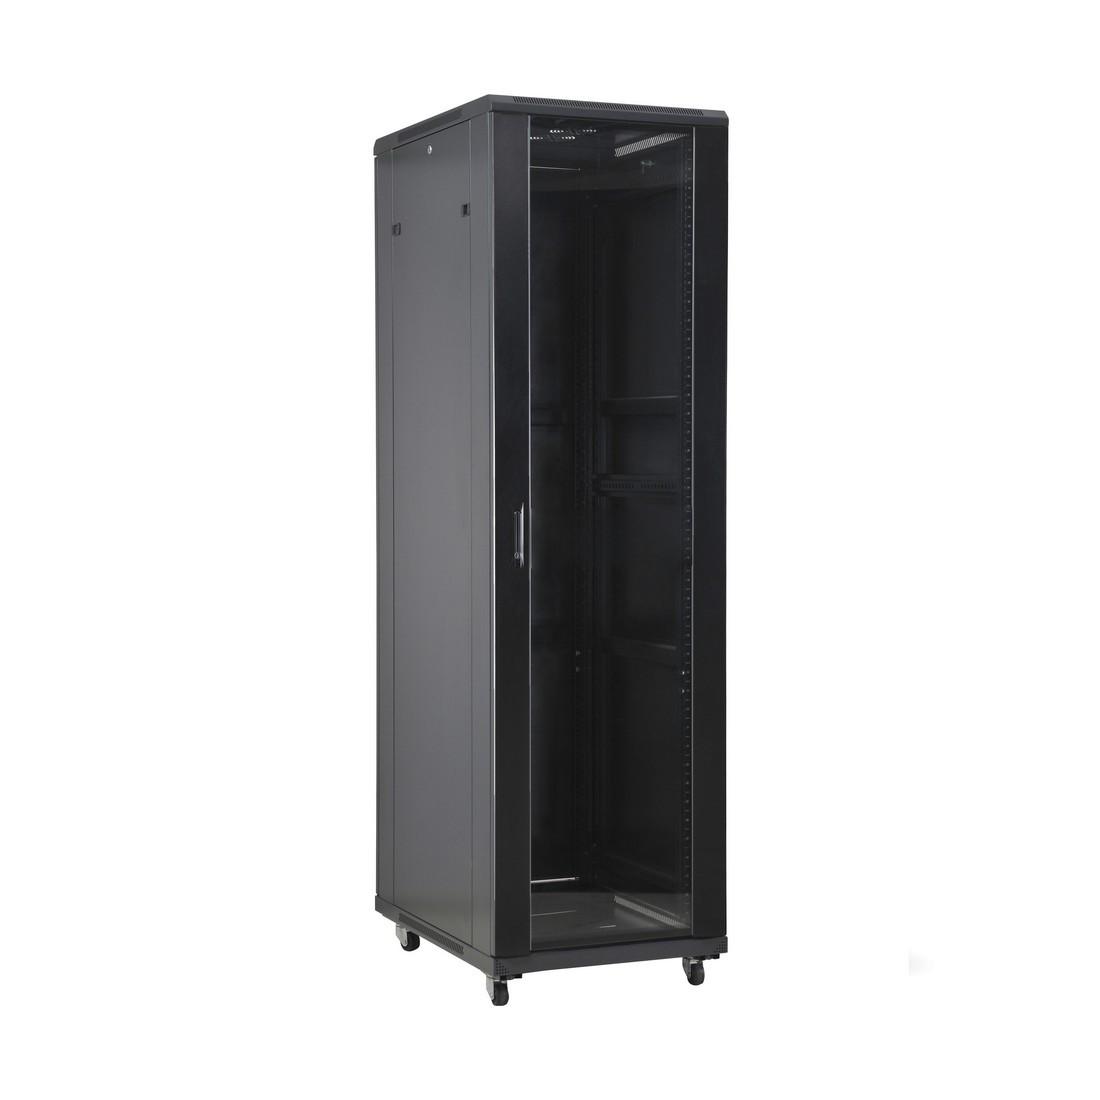 Шкаф серверный SHIP 601S.6842.03.100 42U 600*800*2000 мм